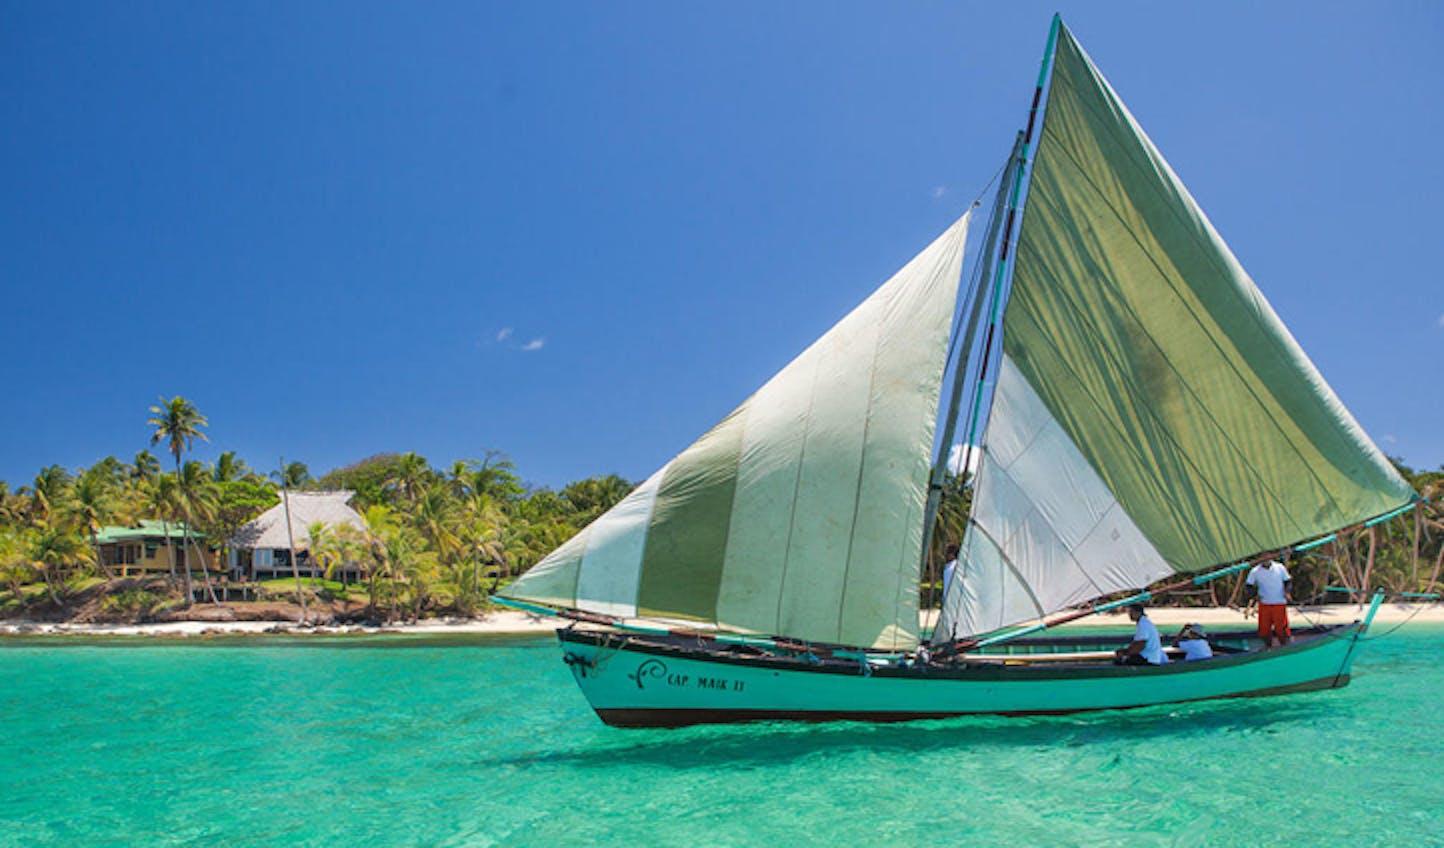 The resort's sailing boat